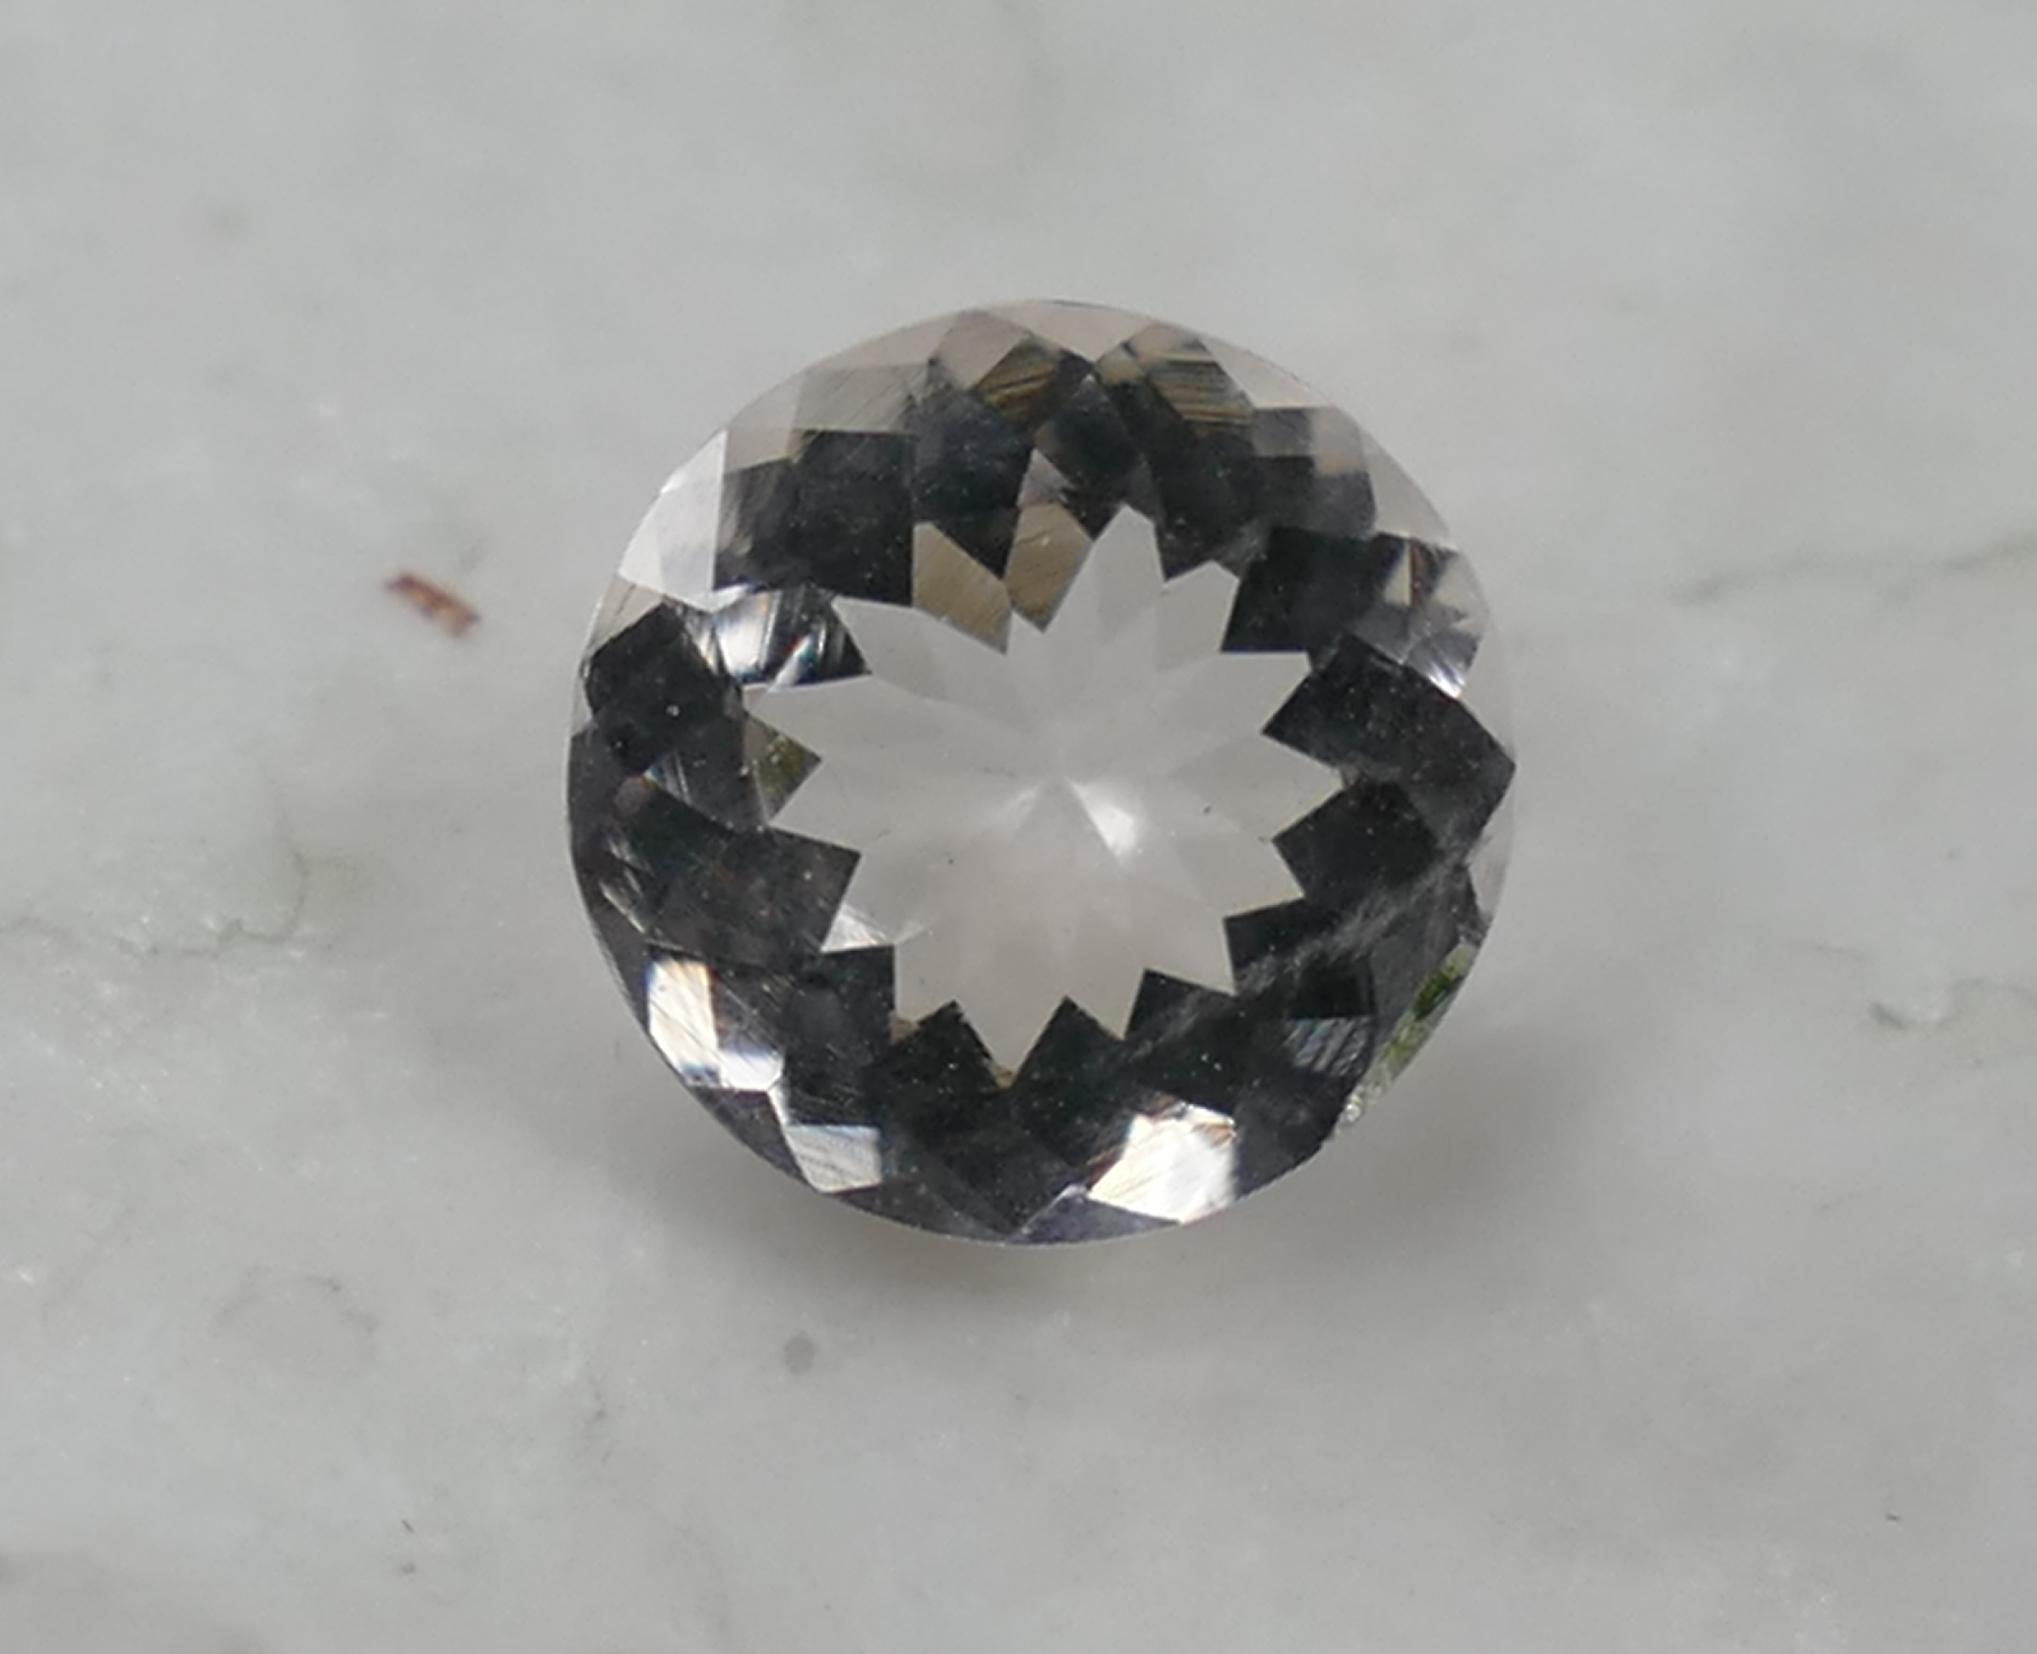 7mm Superbe Morganite Béryl rose léger taille brillant rond spéciale 0.99ct Madagascar (#PB324)